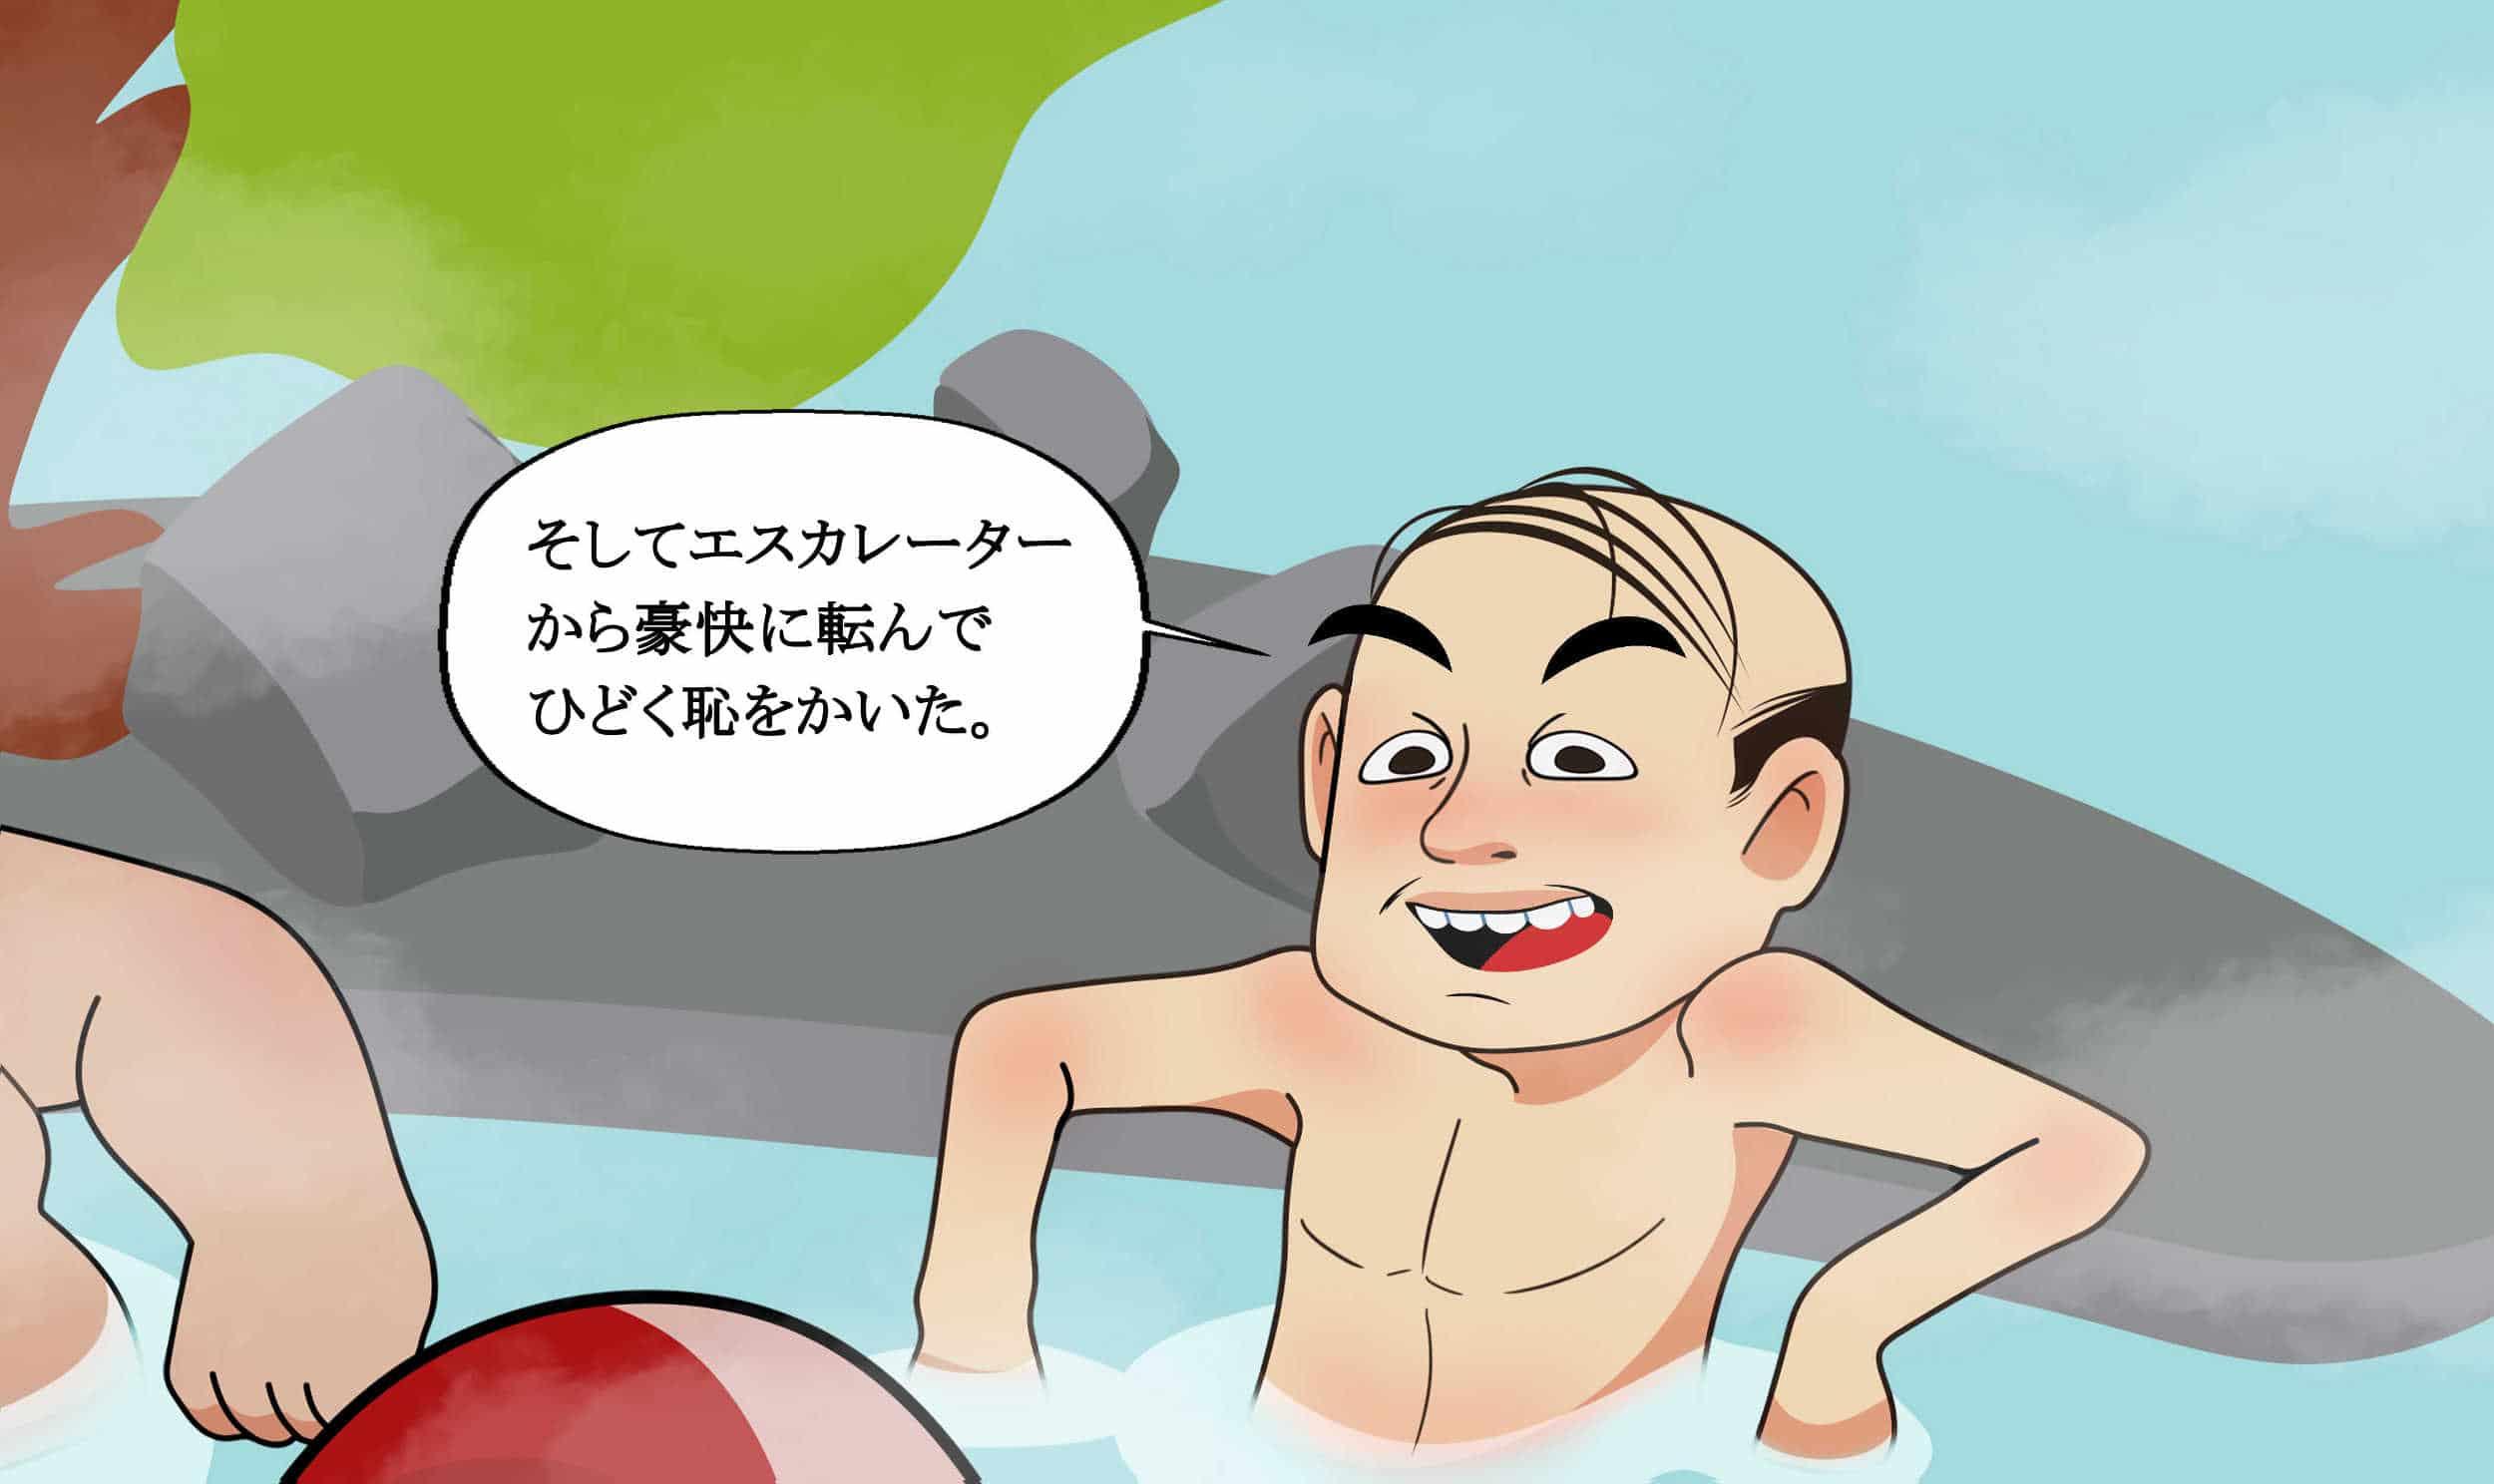 Onsen_34 (repeat)-min.jpg